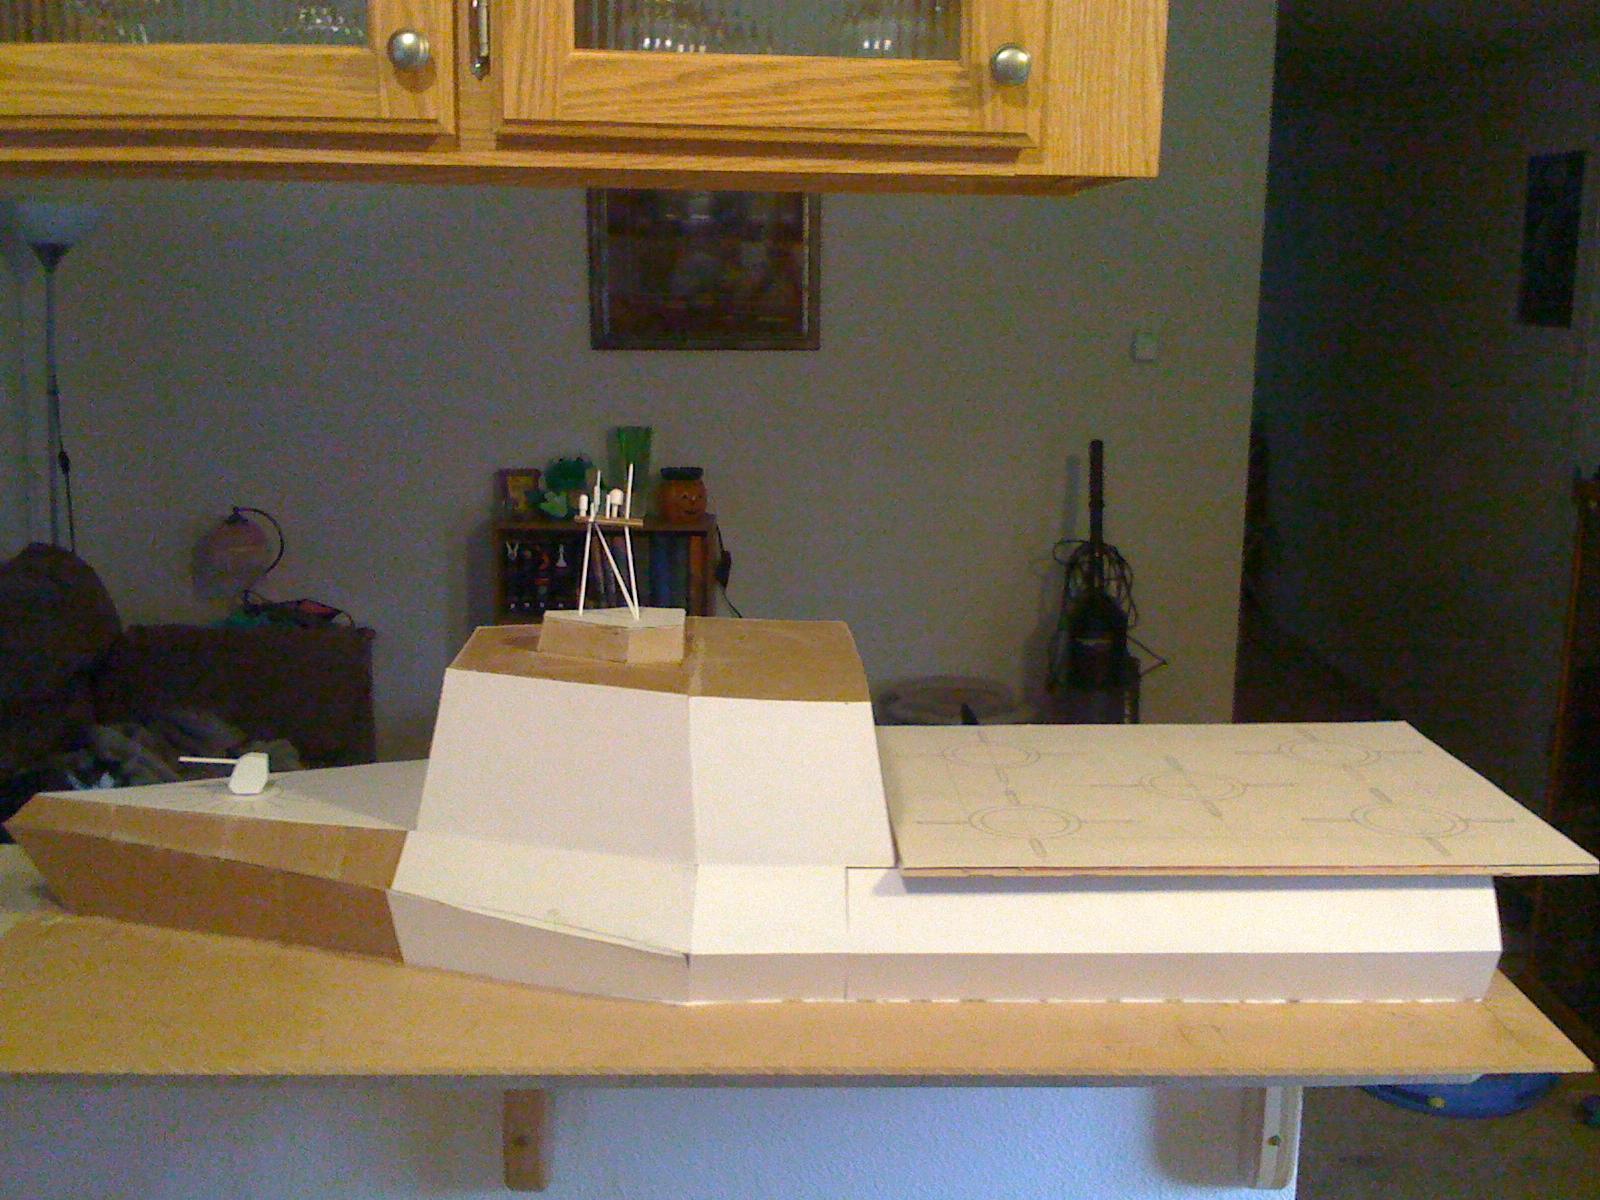 Boat, Built, Frigate, Guard, Imperial, Scratch, Ship, Warhammer 40,000, Work In Progress